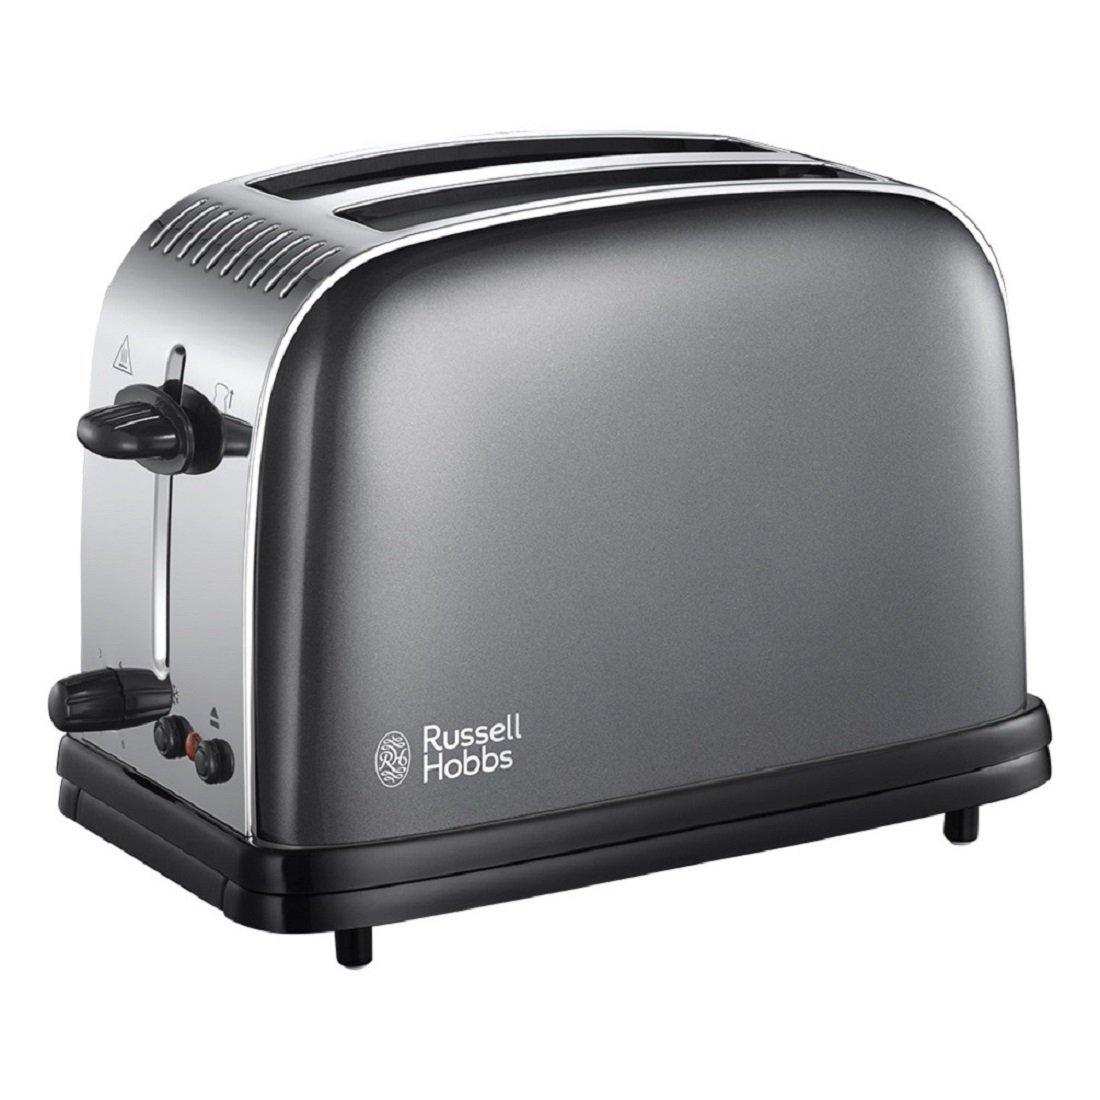 Russell Hobbs Colour Plus 2-Slice Toaster 23332 - Grey £17.99 Prime / £22.38 Non Prime @ Amazon